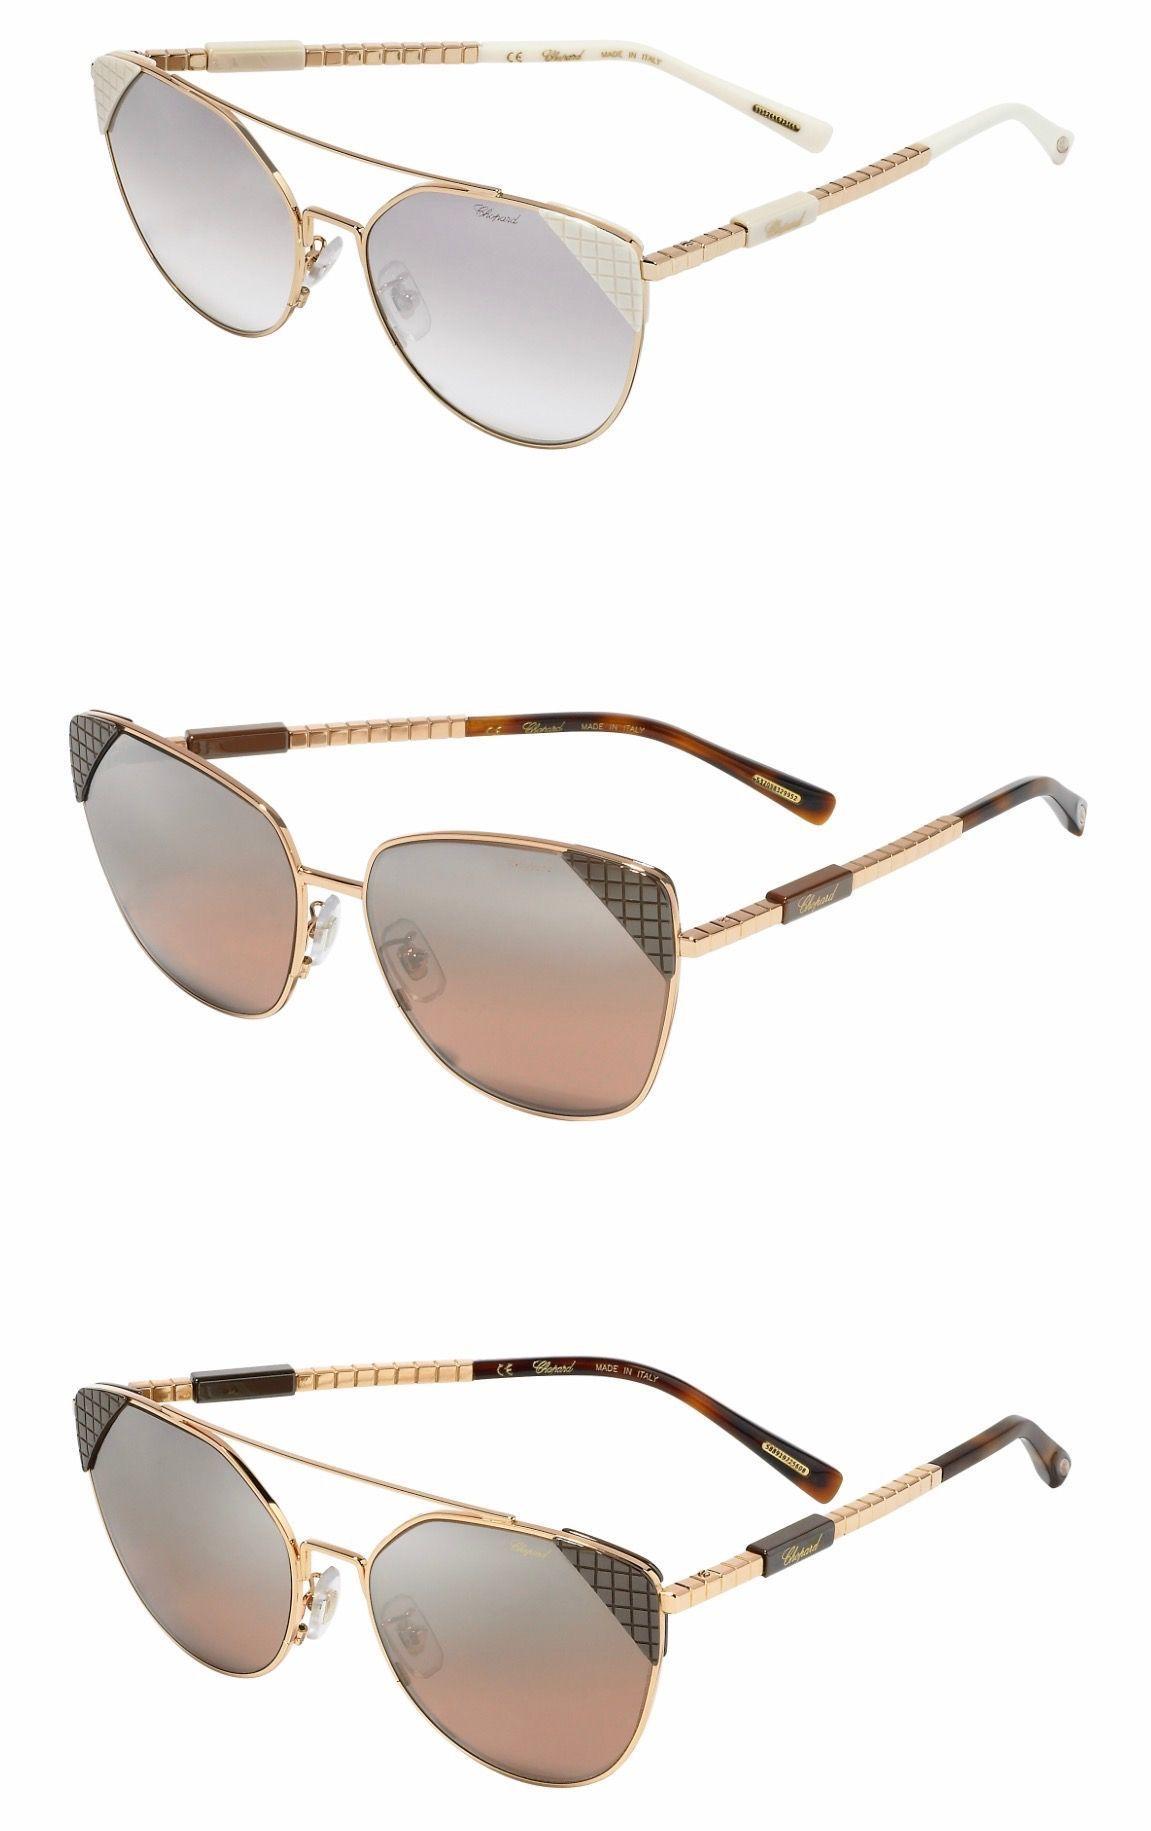 Chopard: Ice Cube Eyewear Collection